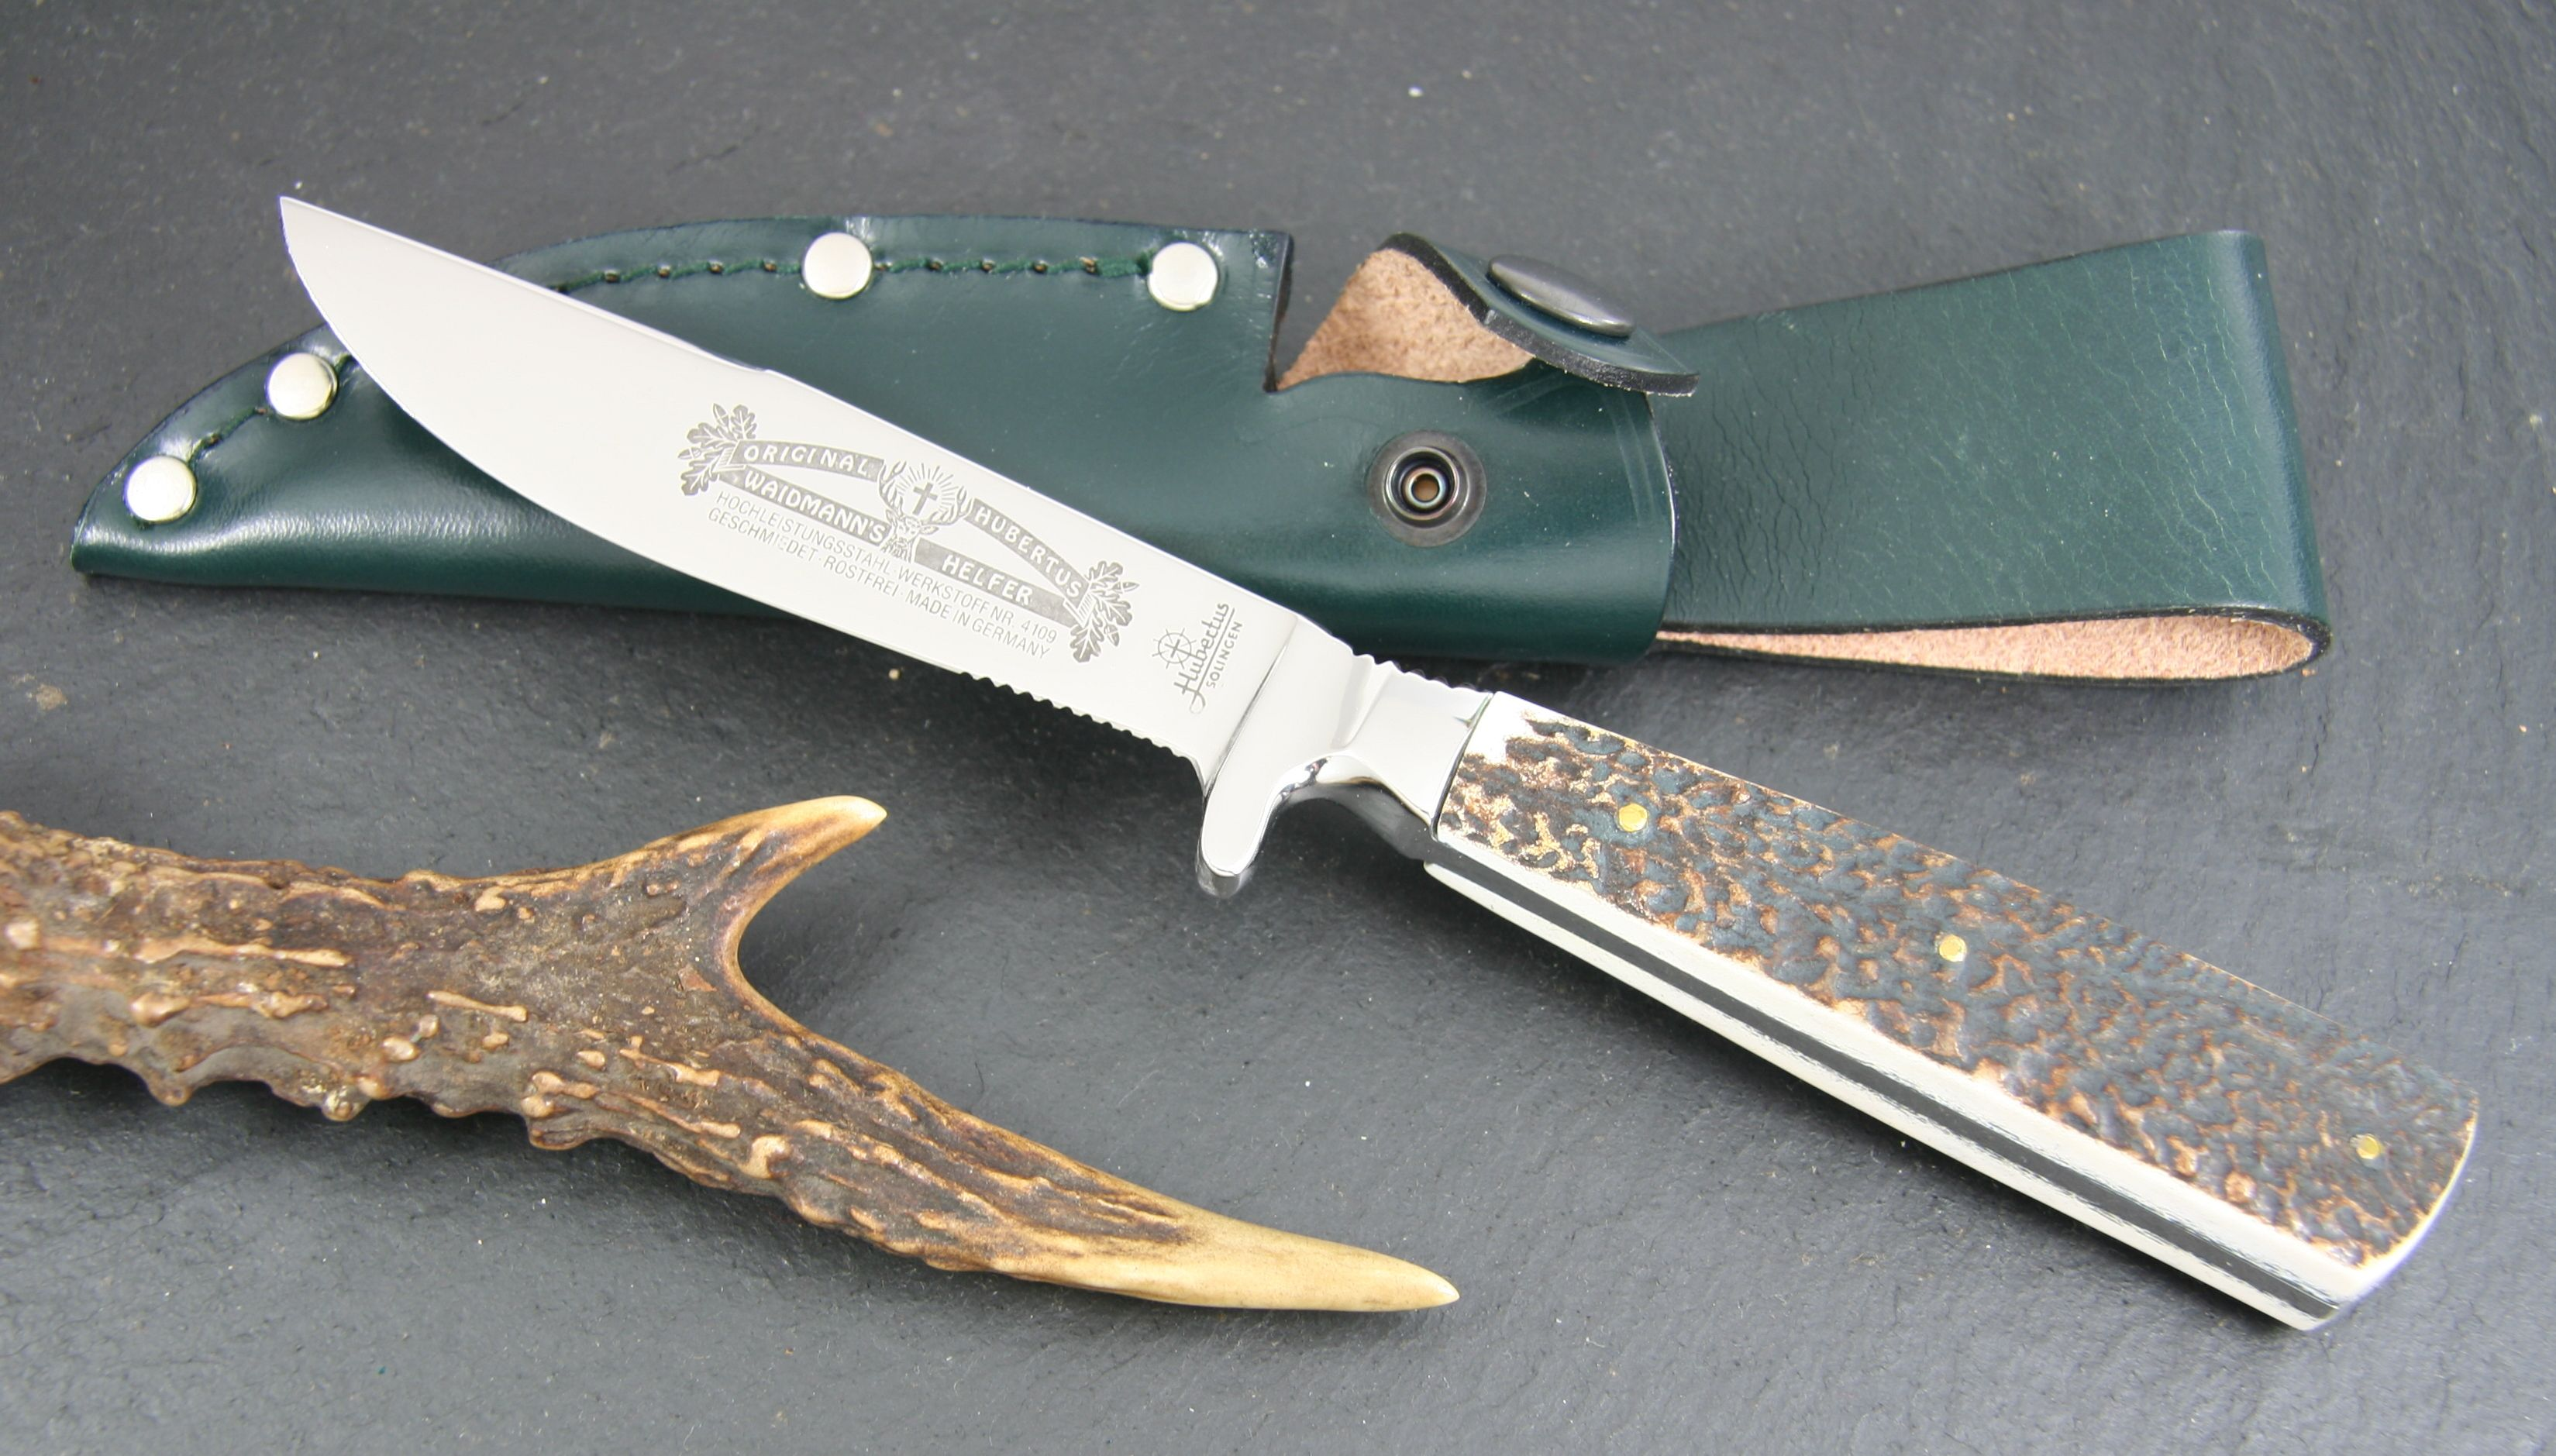 Hubertus Waidmann's Helfer Fixed 4.25 inch Satin Combo Blade, Stag Handles, Leather Sheath